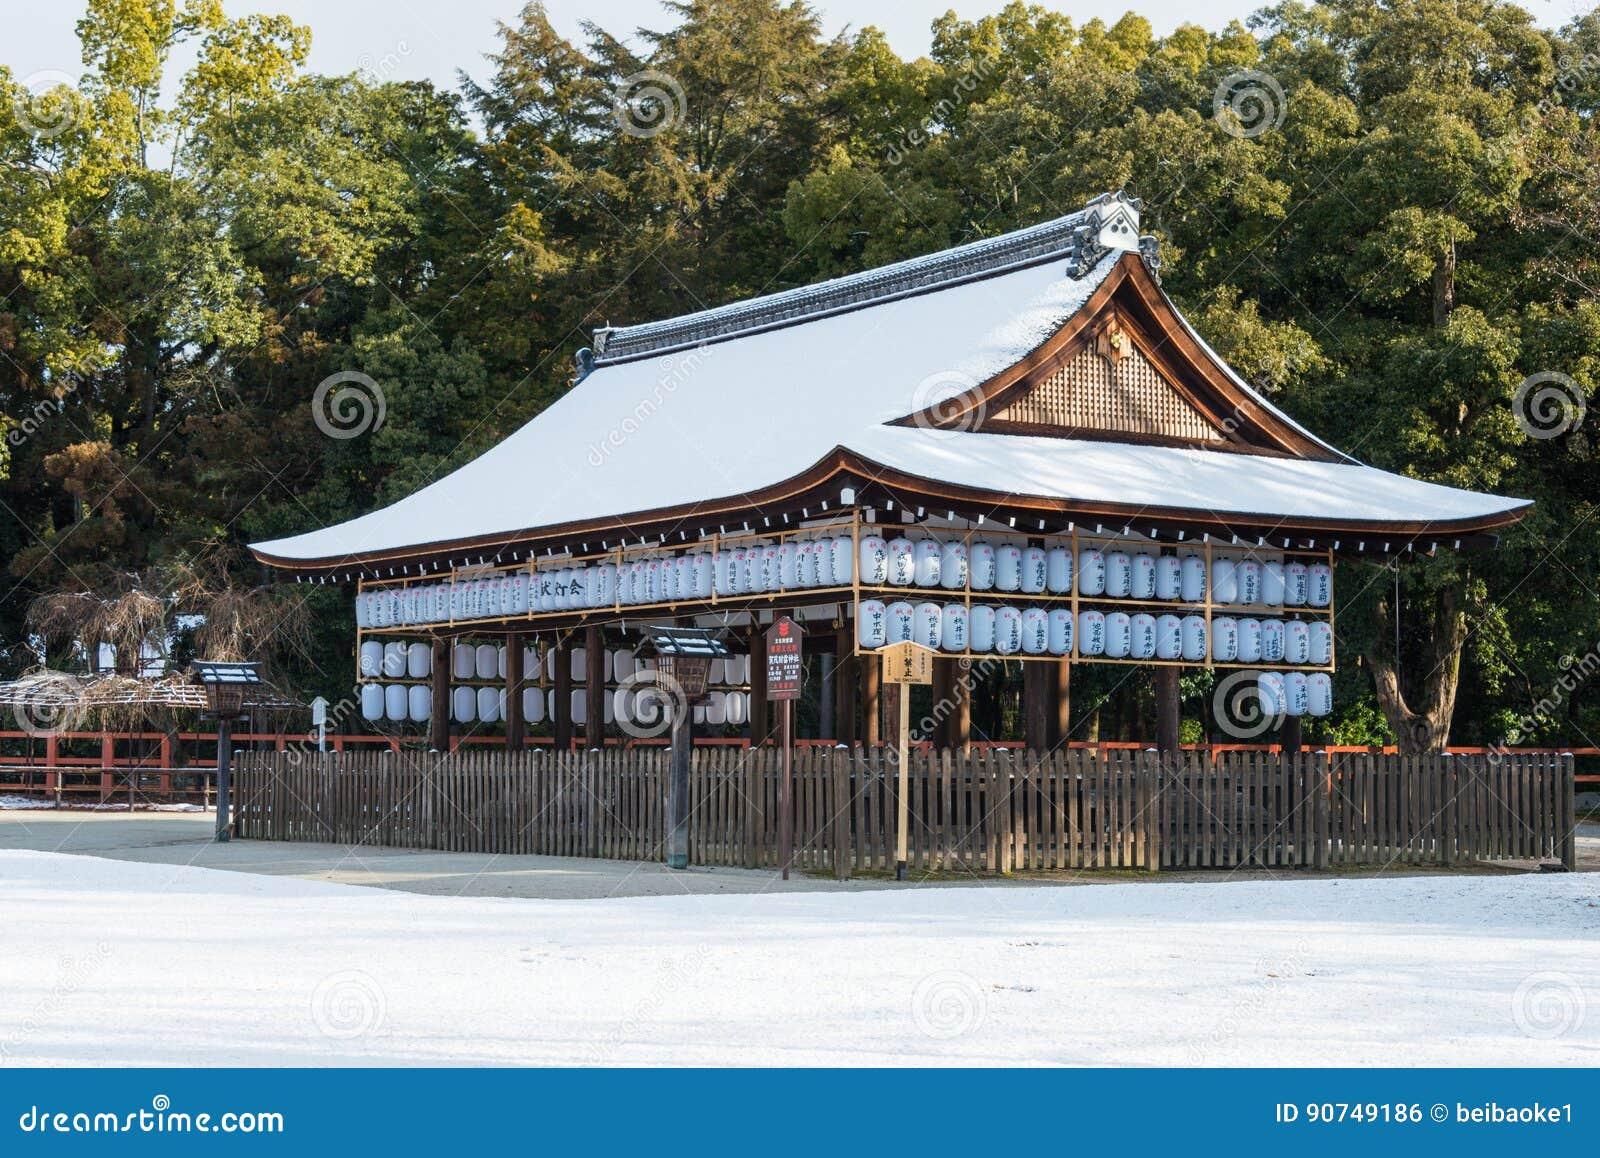 KYOTO, JAPAN - 12 Januari 2015: Kamigamo-Jinjaheiligdom een beroemde shri